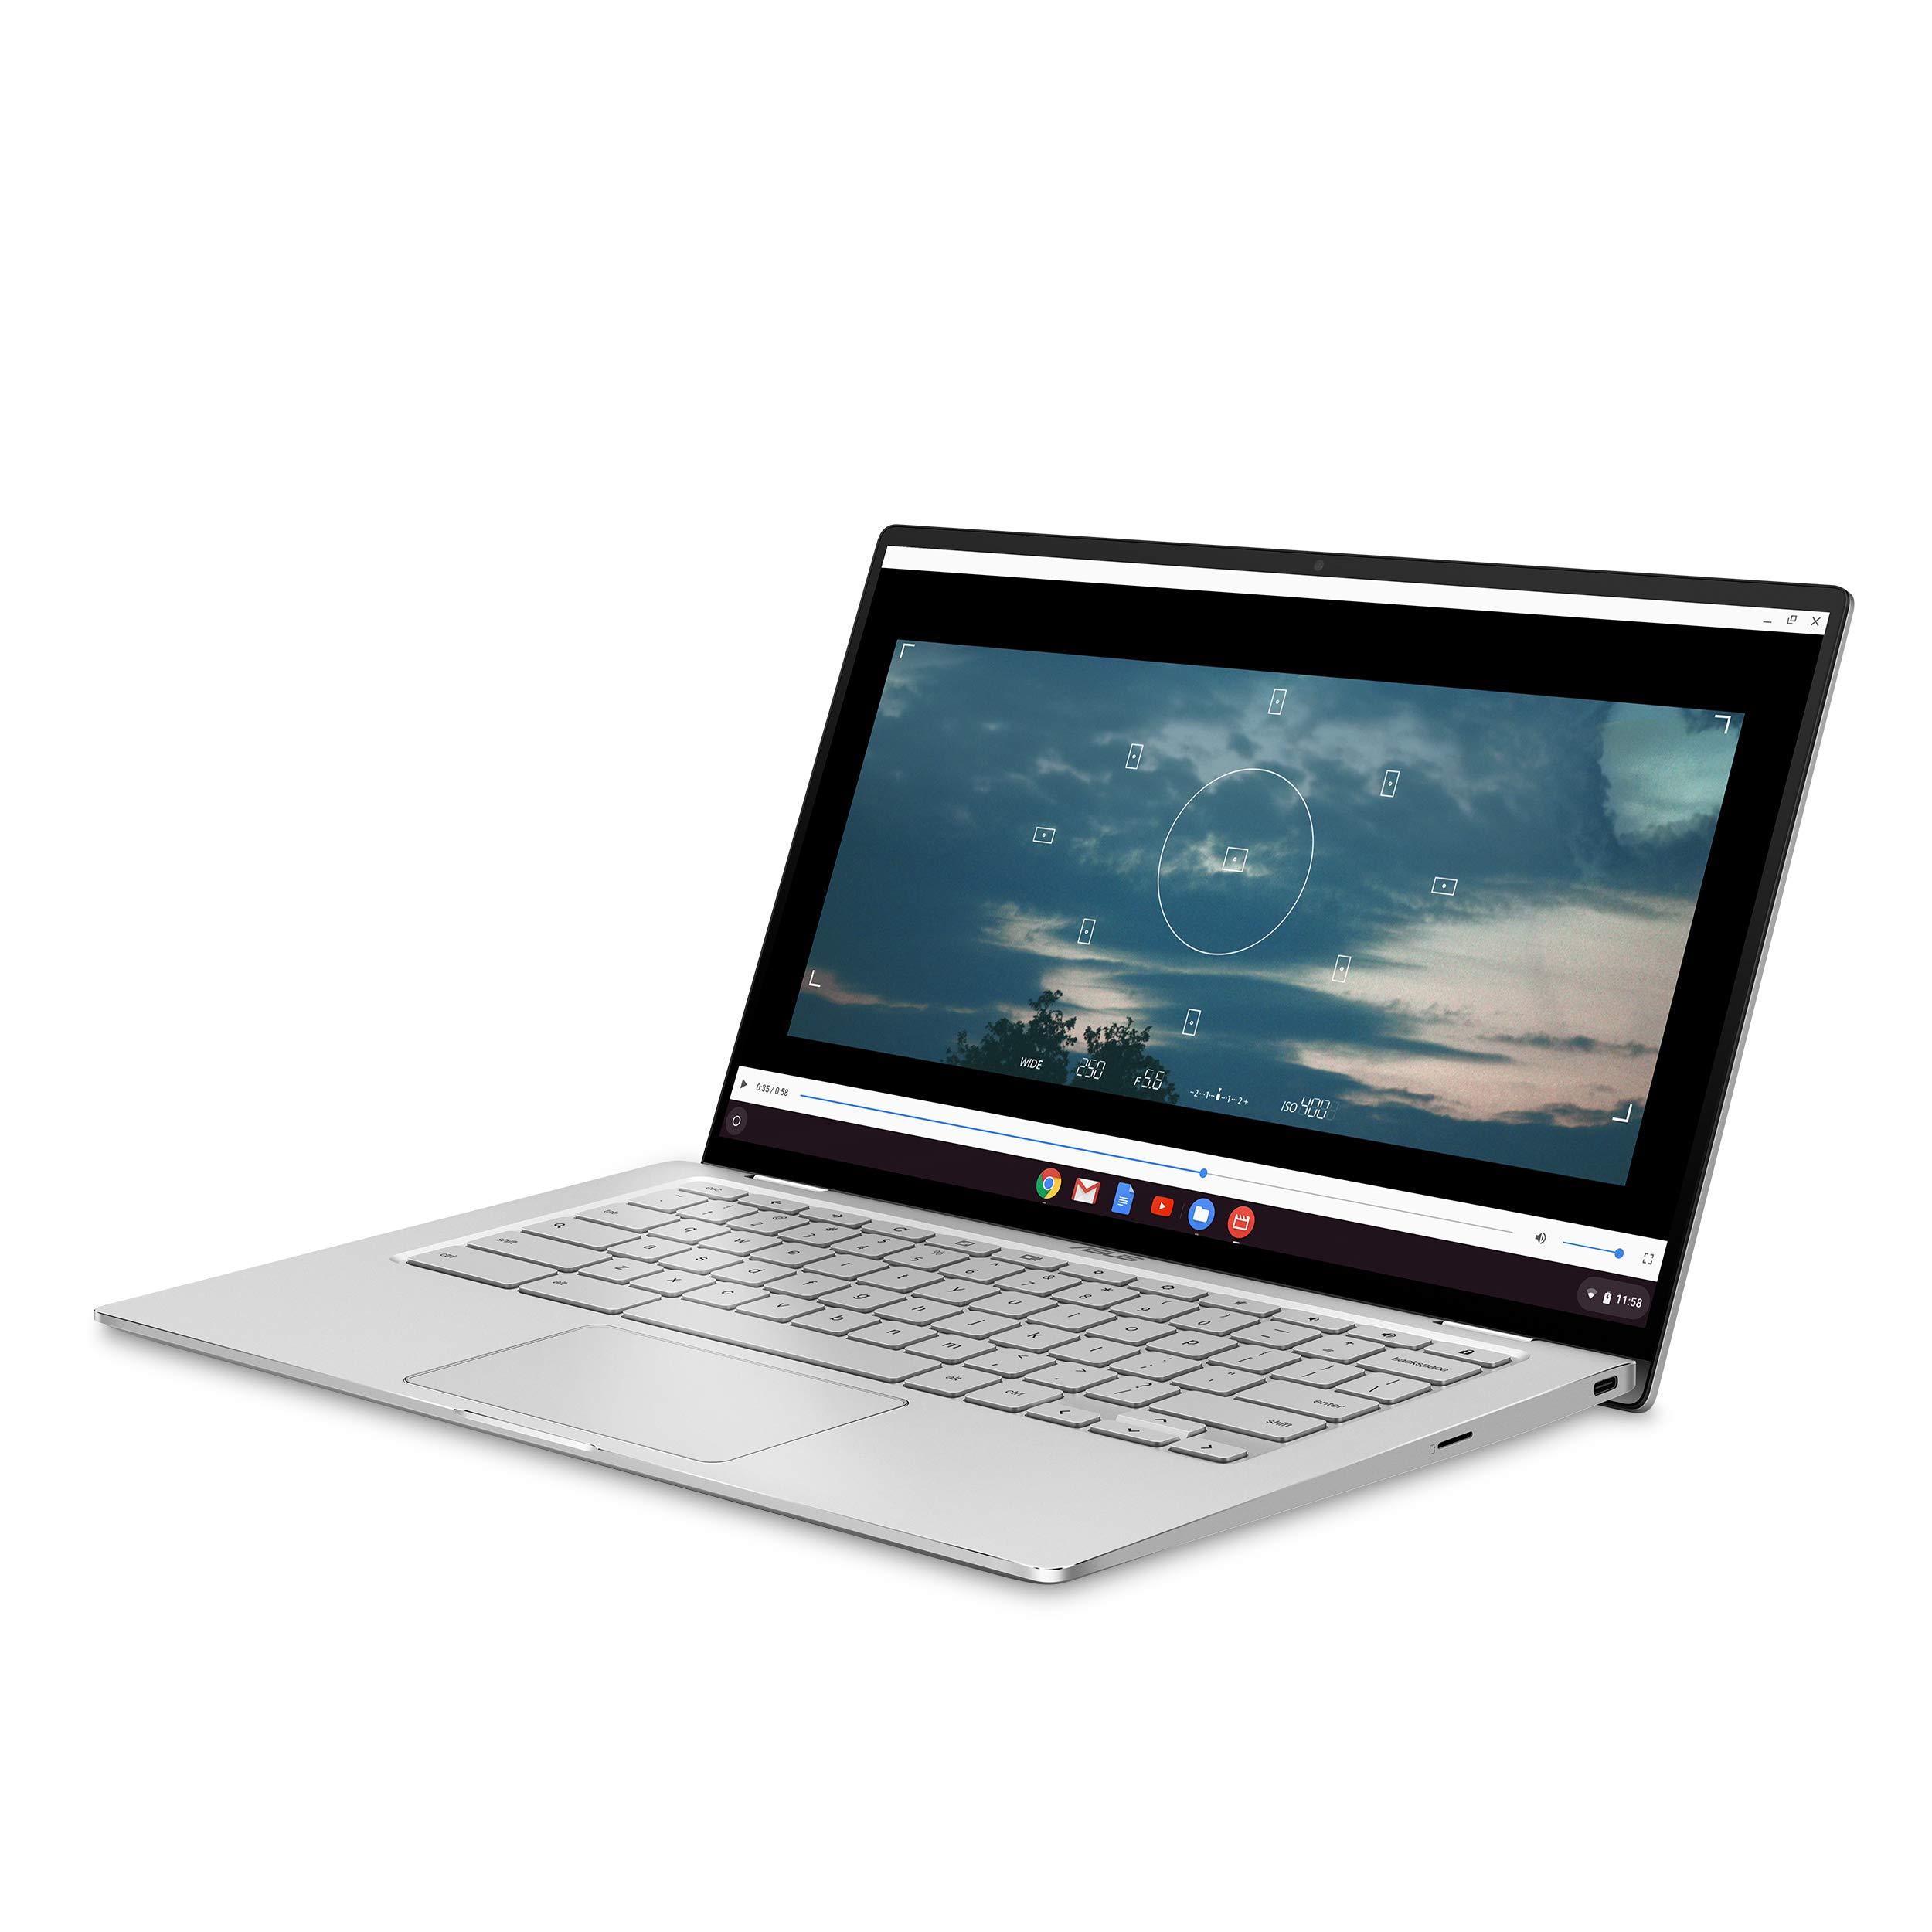 ASUS Chromebook Flip C434TA-DSM4T 2-in-1 Laptop 14'' Touchscreen Full HD 4-Way NanoEdge, Intel Core M3-8100Y Processor, 4GB RAM, 64GB eMMC Storage, Chrome OS by ASUS (Image #7)